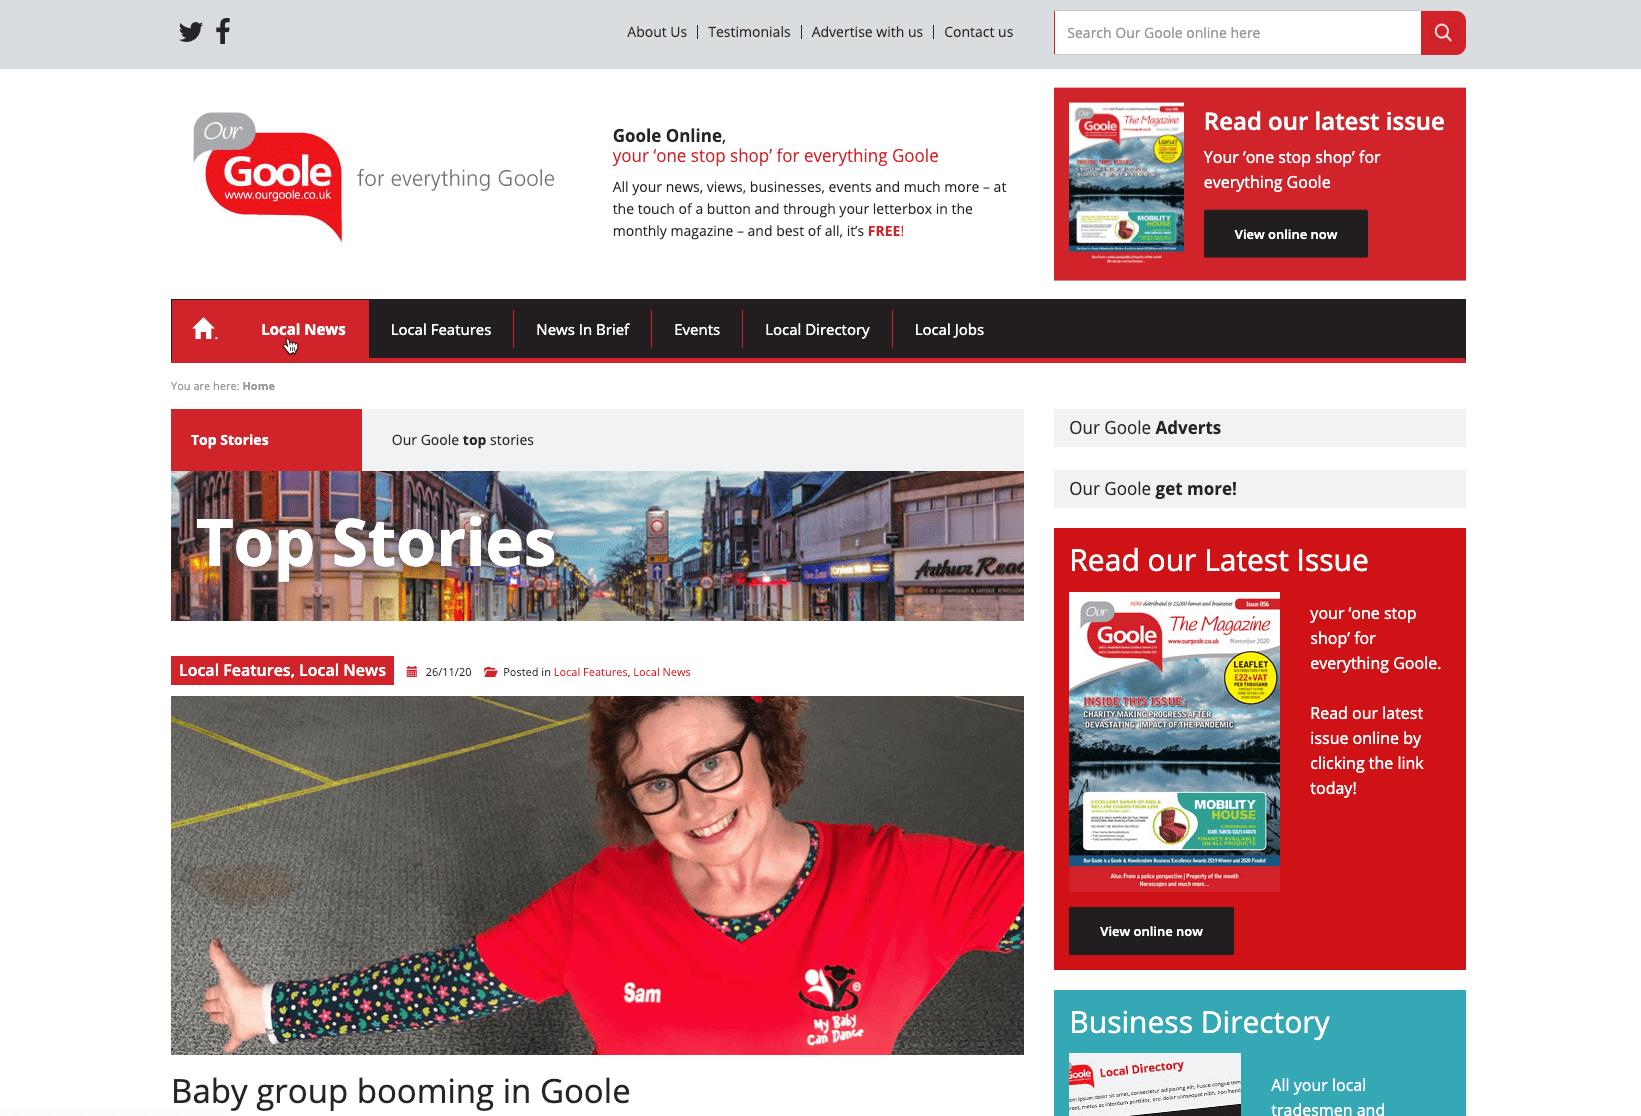 Screenshot of the CreateTVT website